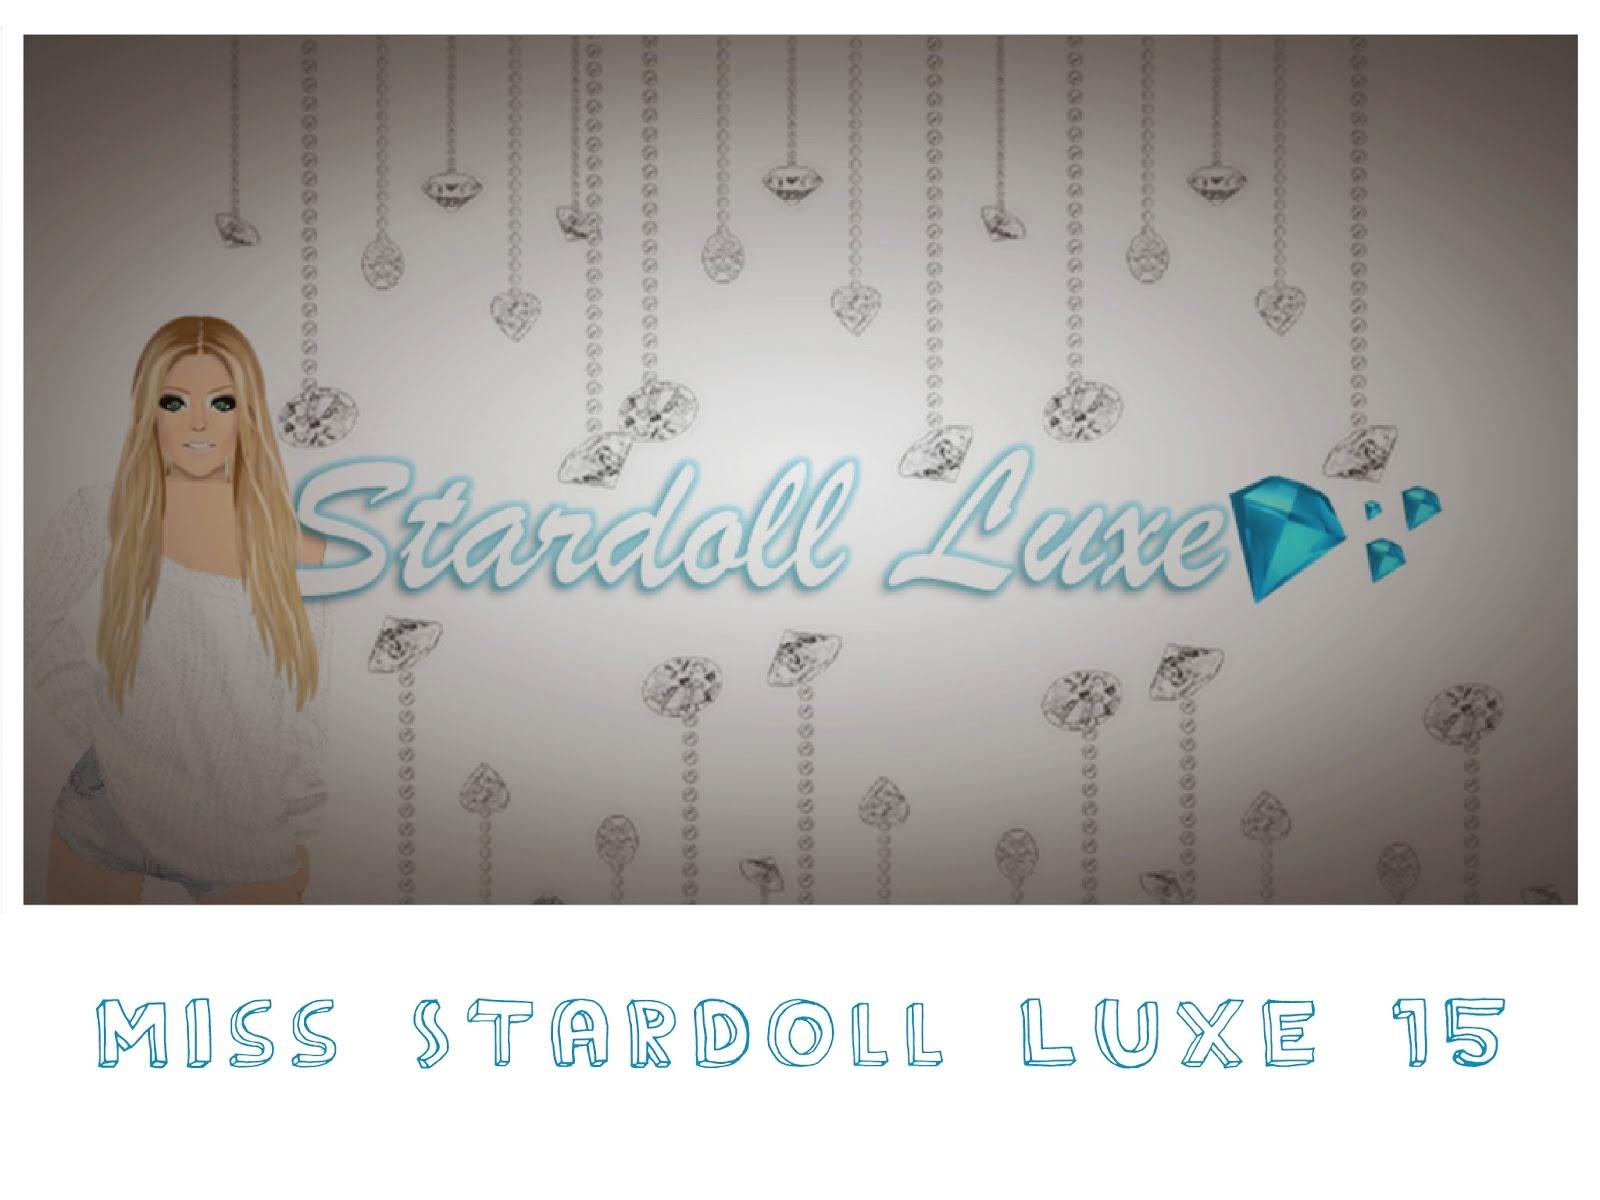 Votação para Miss Stardoll Luxe